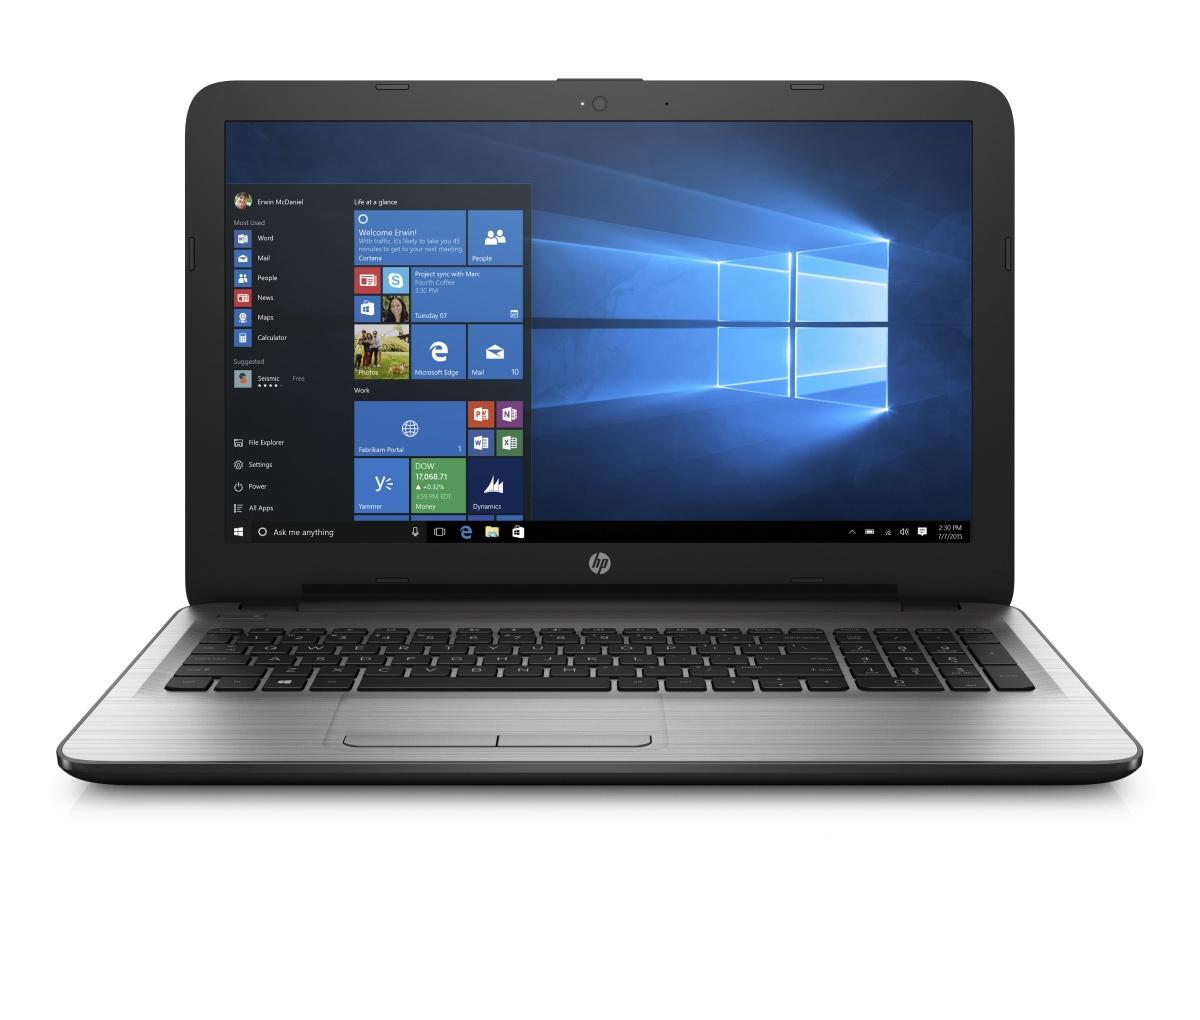 HP 250 G5 i5-6200U/4GB/1TB/15,6'' FHD/Win 10/silver